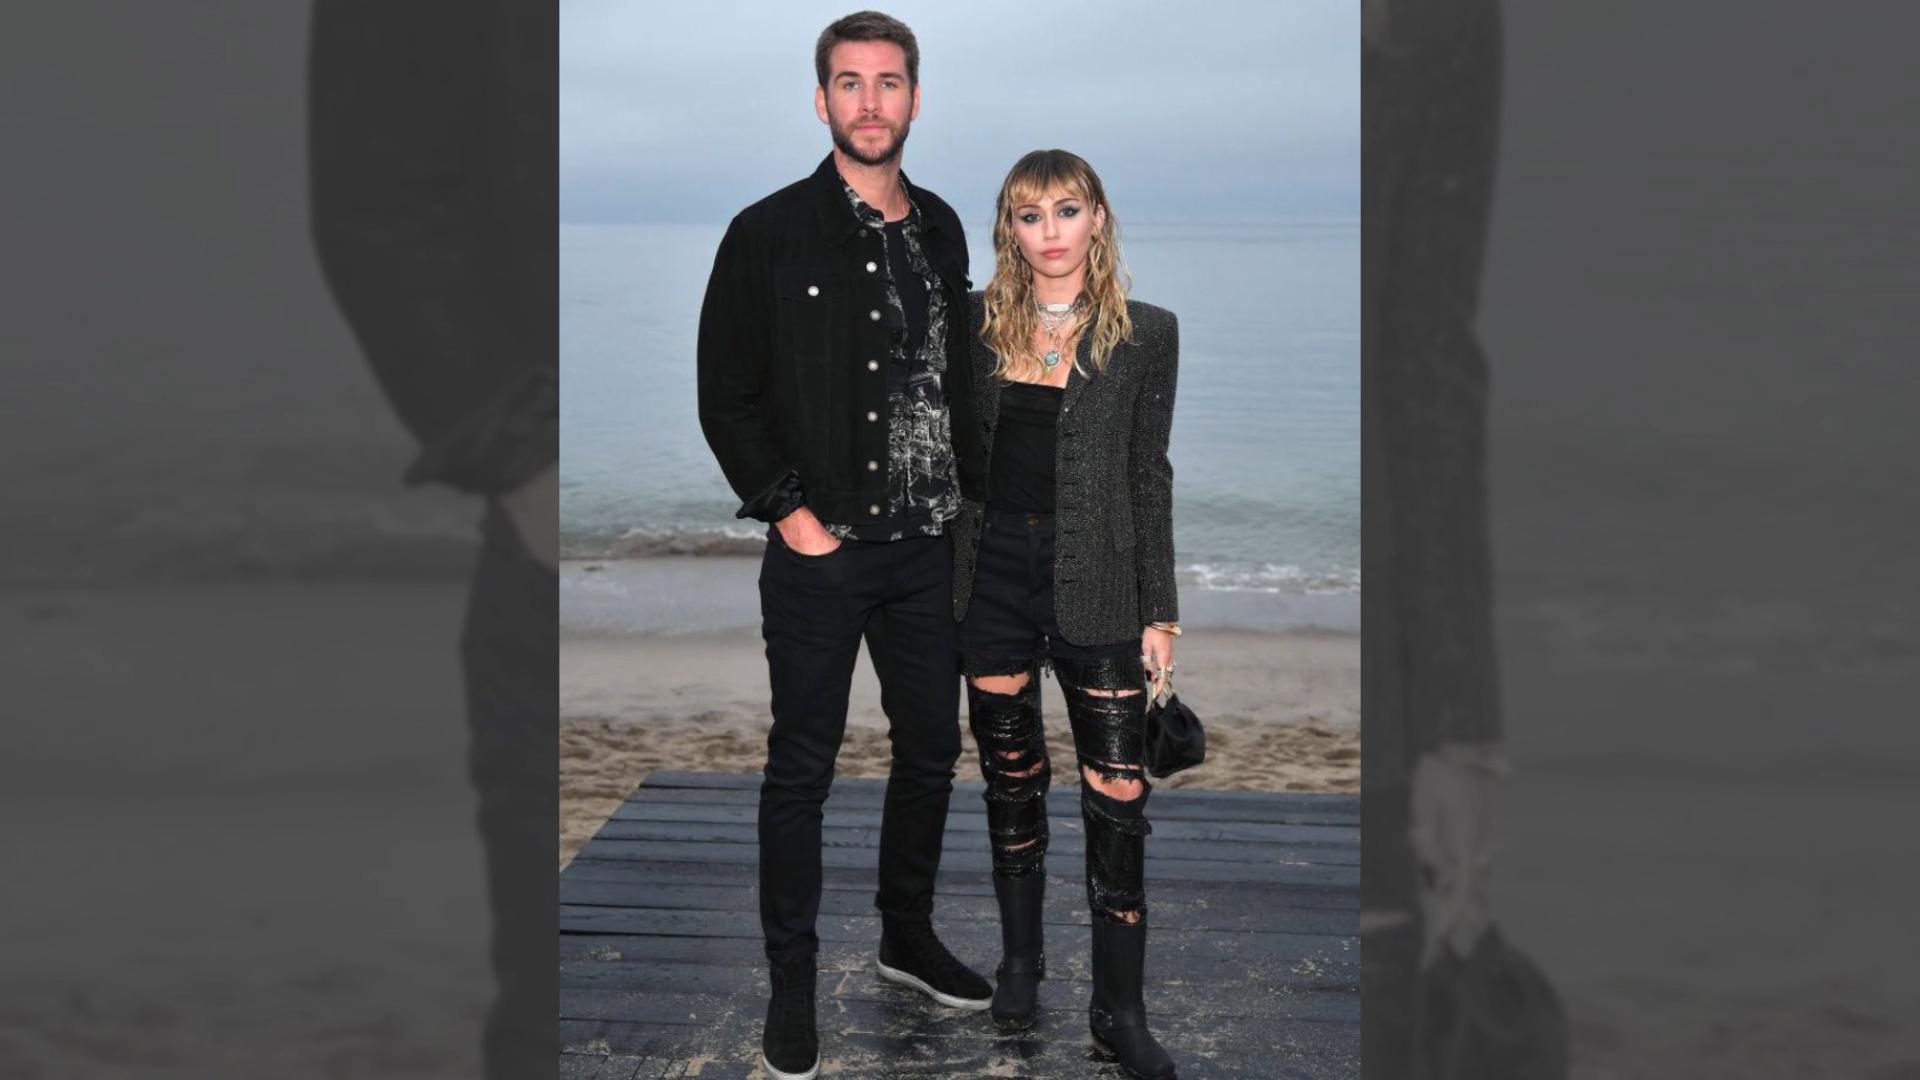 Miley Cyrus «déçue» par la demande de divorce de Liam Hemsworth